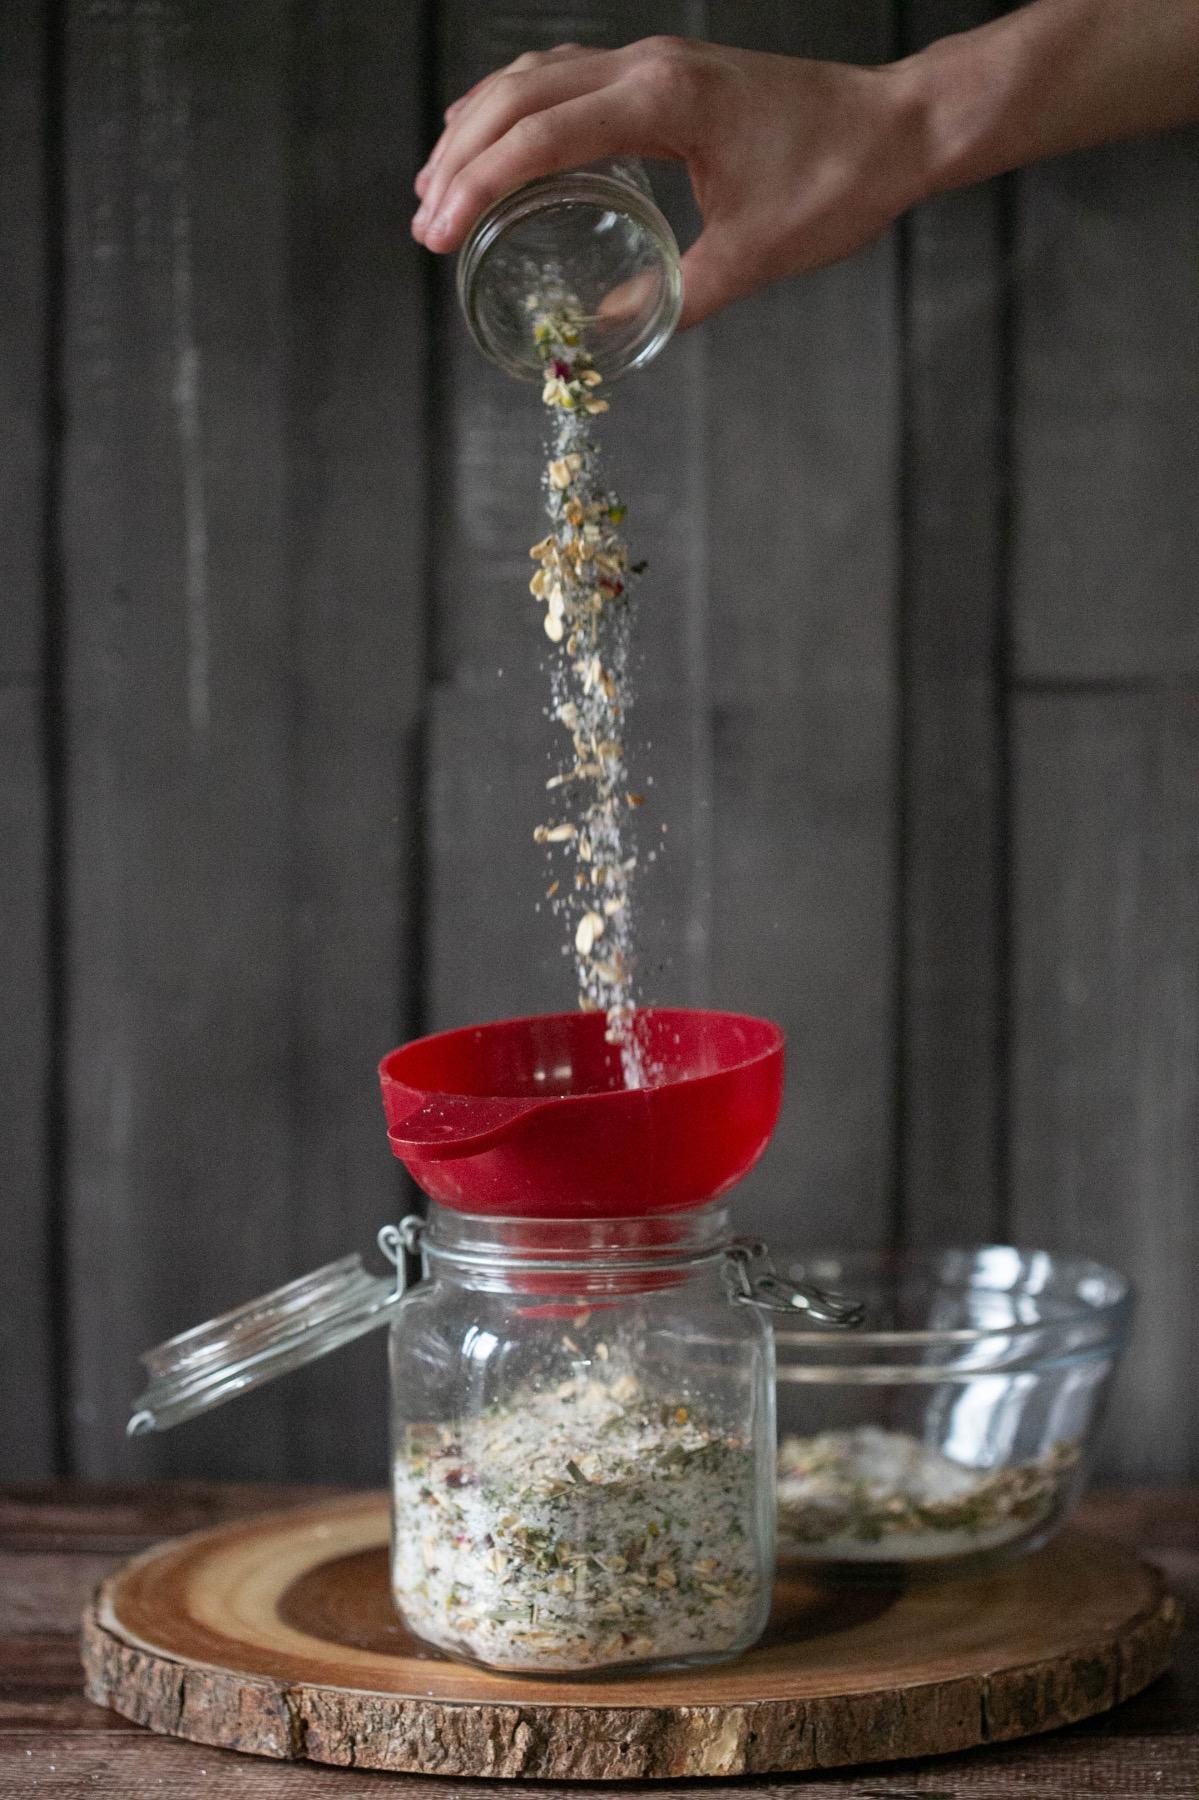 epsom salt and oatmeal bath soak recipe pop shop america